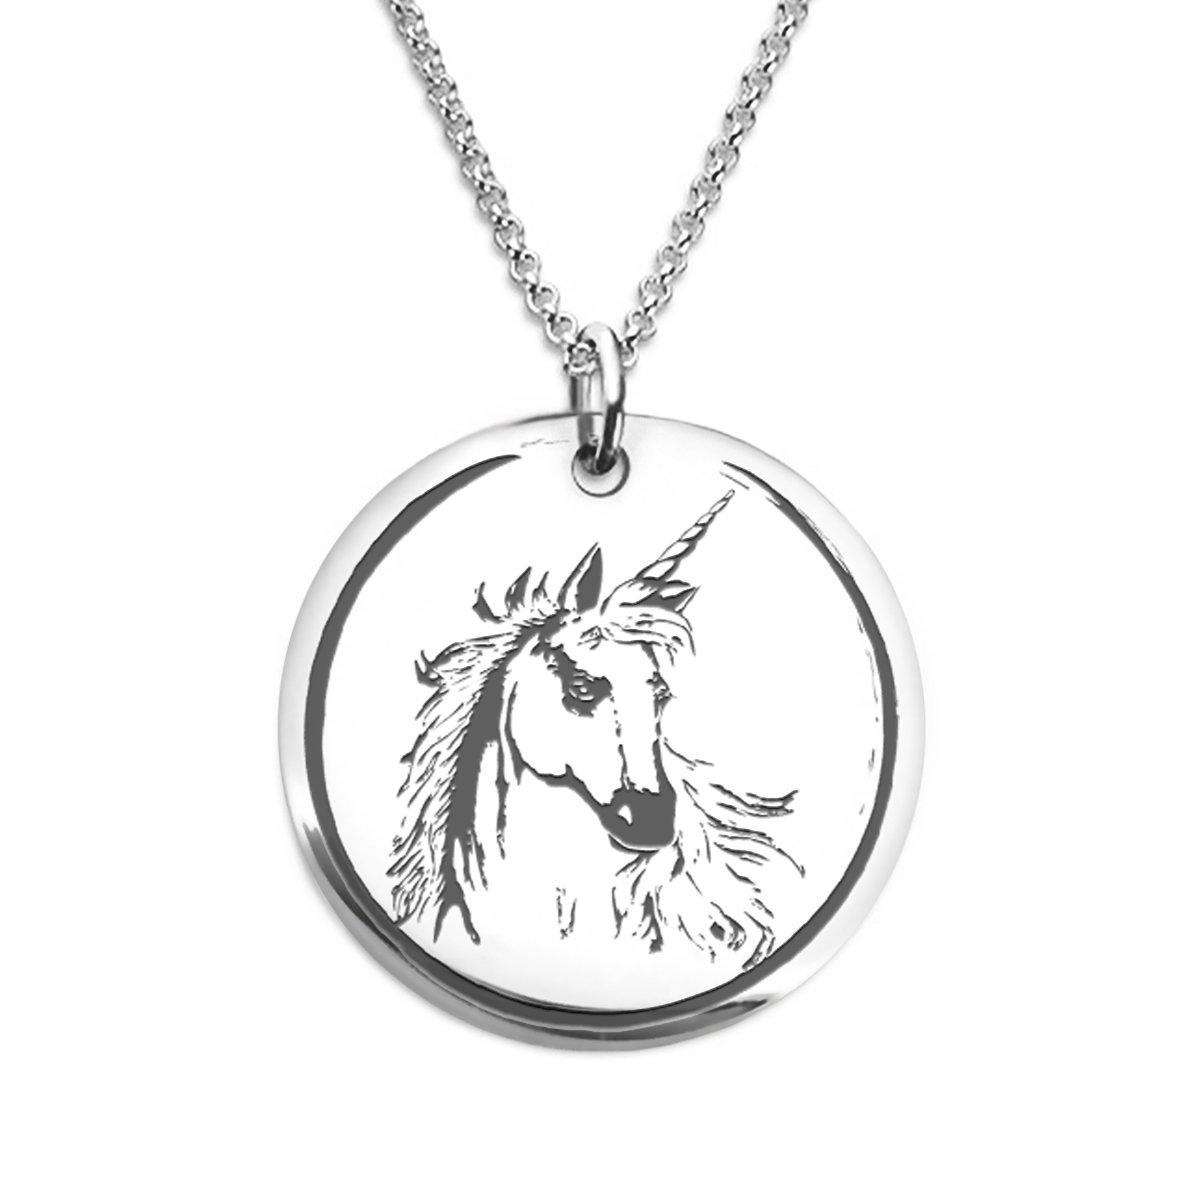 Unicornio Matif Fierce Unicorn Necklace Stainless Steel Laser Engraved Pendant